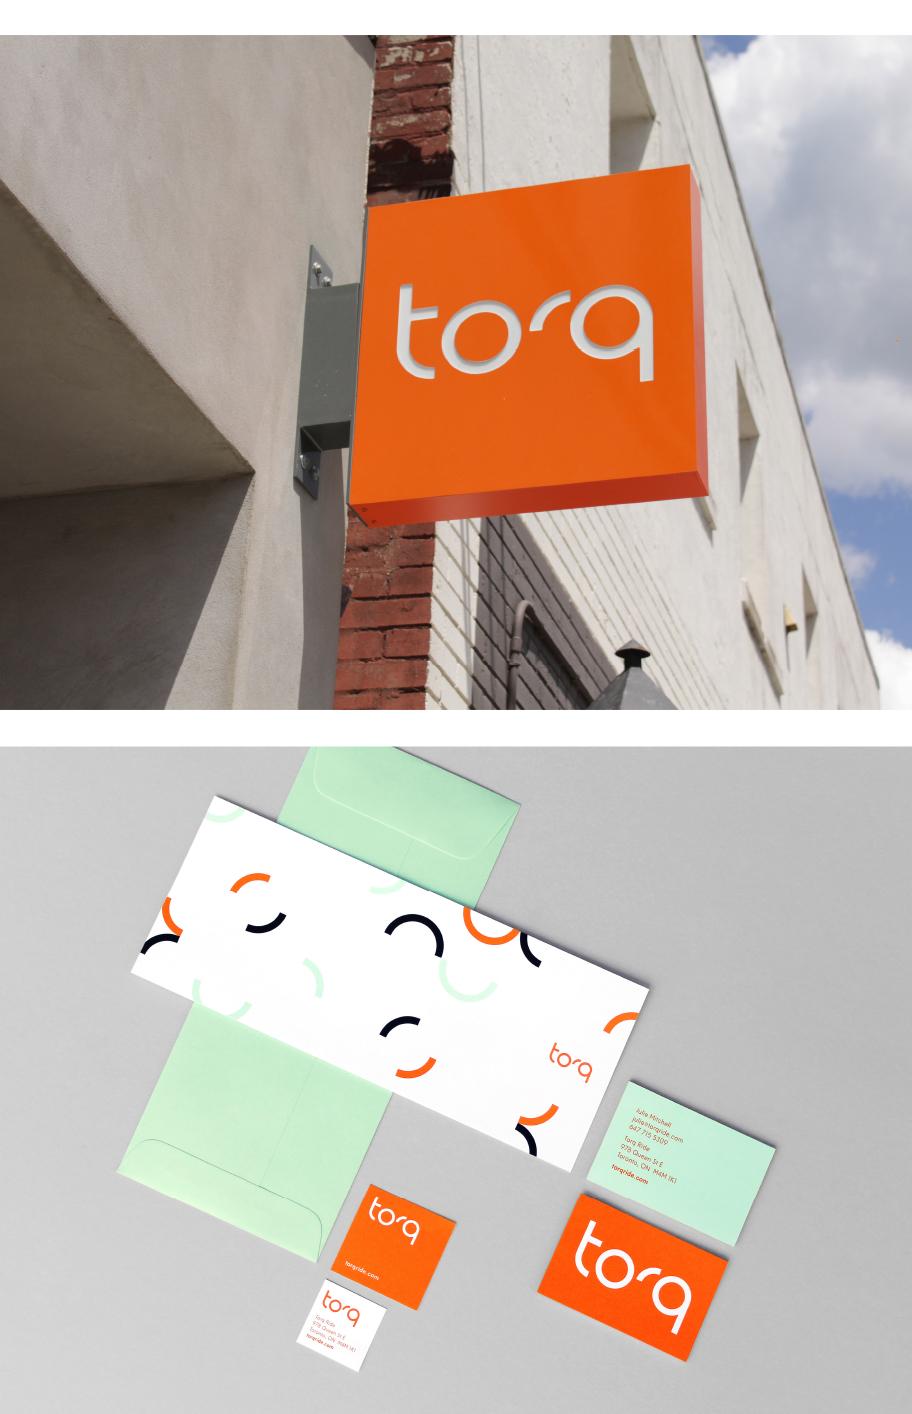 torq-image-4